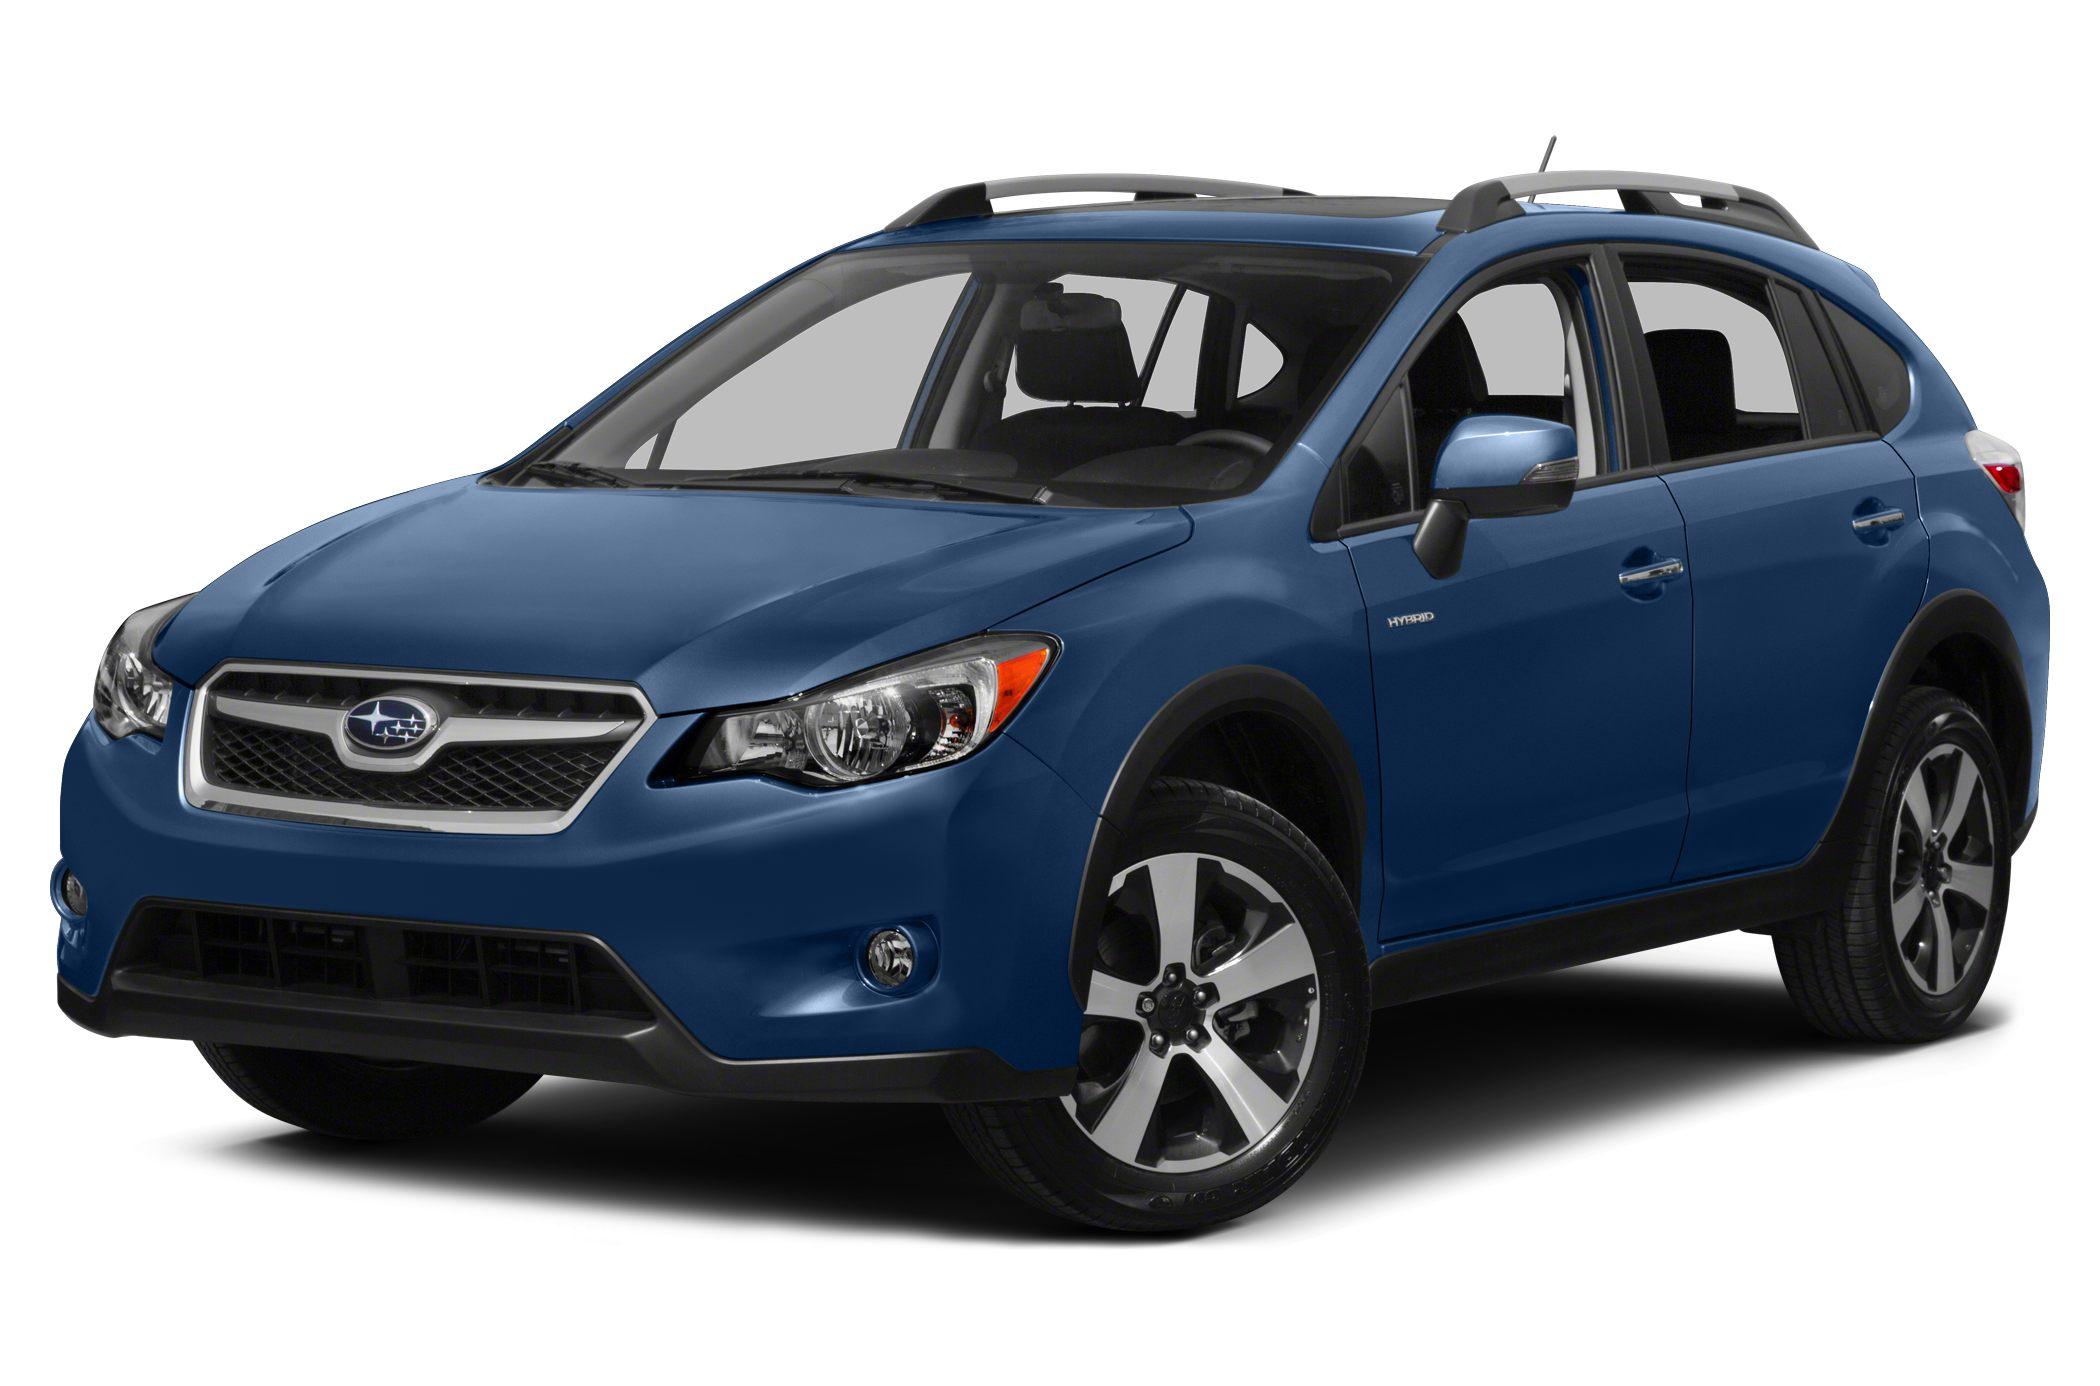 subaru xv crosstrek hybrid prices, reviews and new model